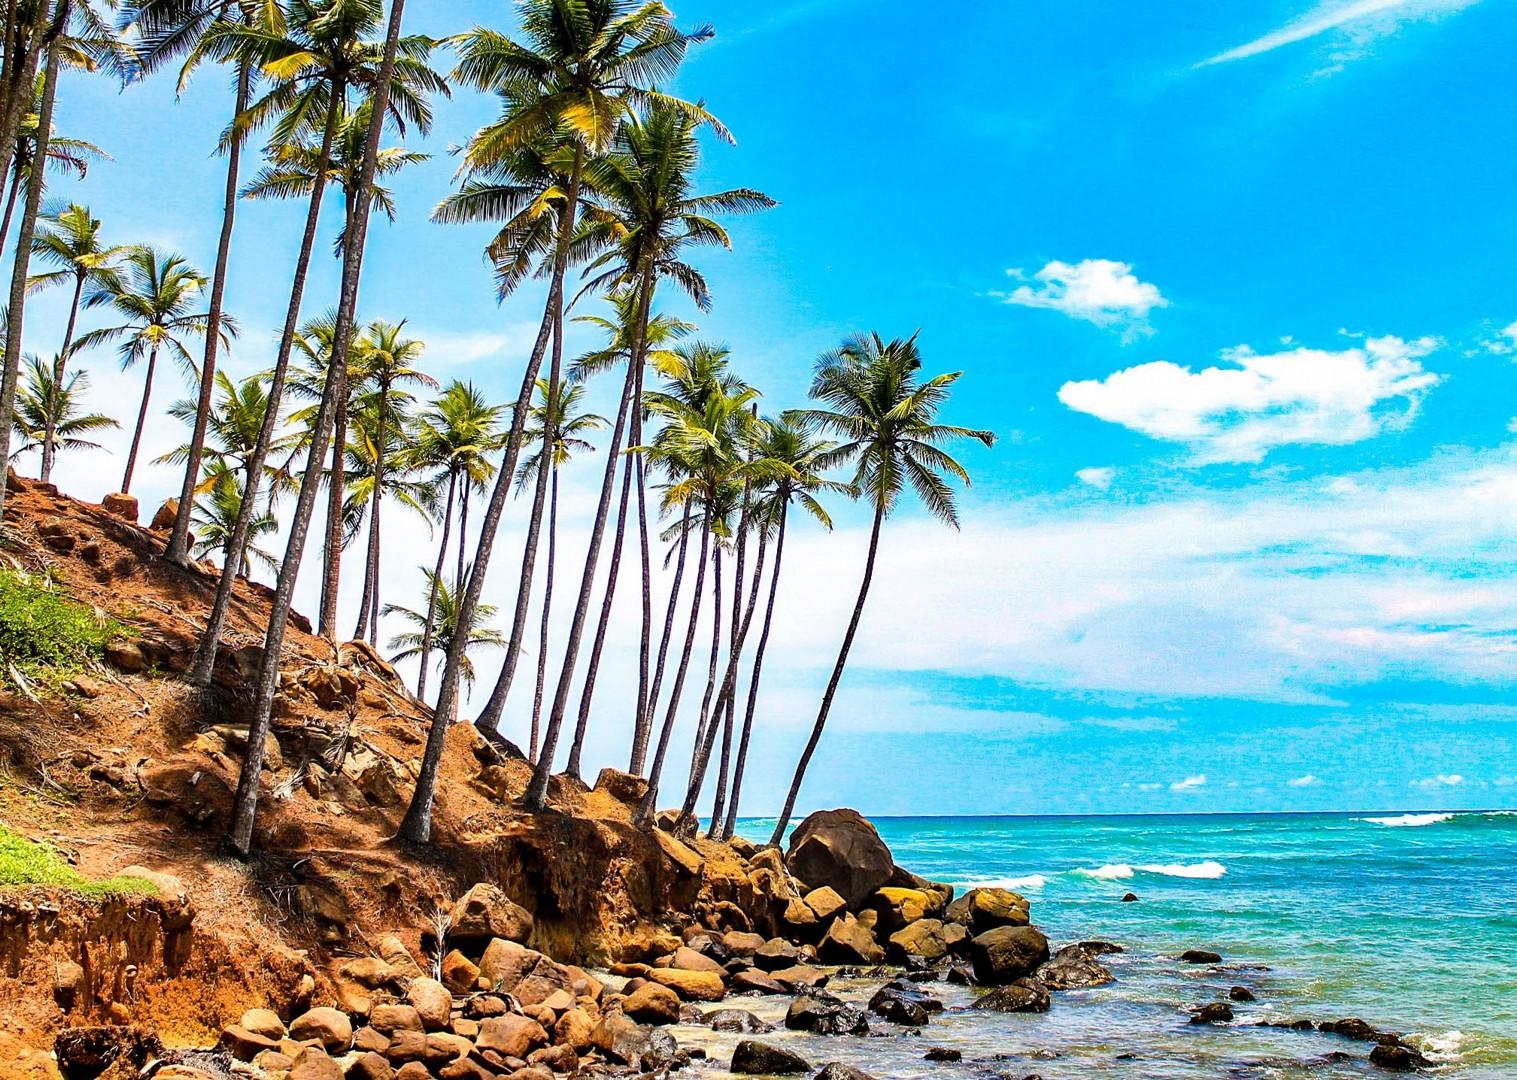 IMG_4524.jpg - Sri Lanka - Backroads and Beaches - Cycling Adventures